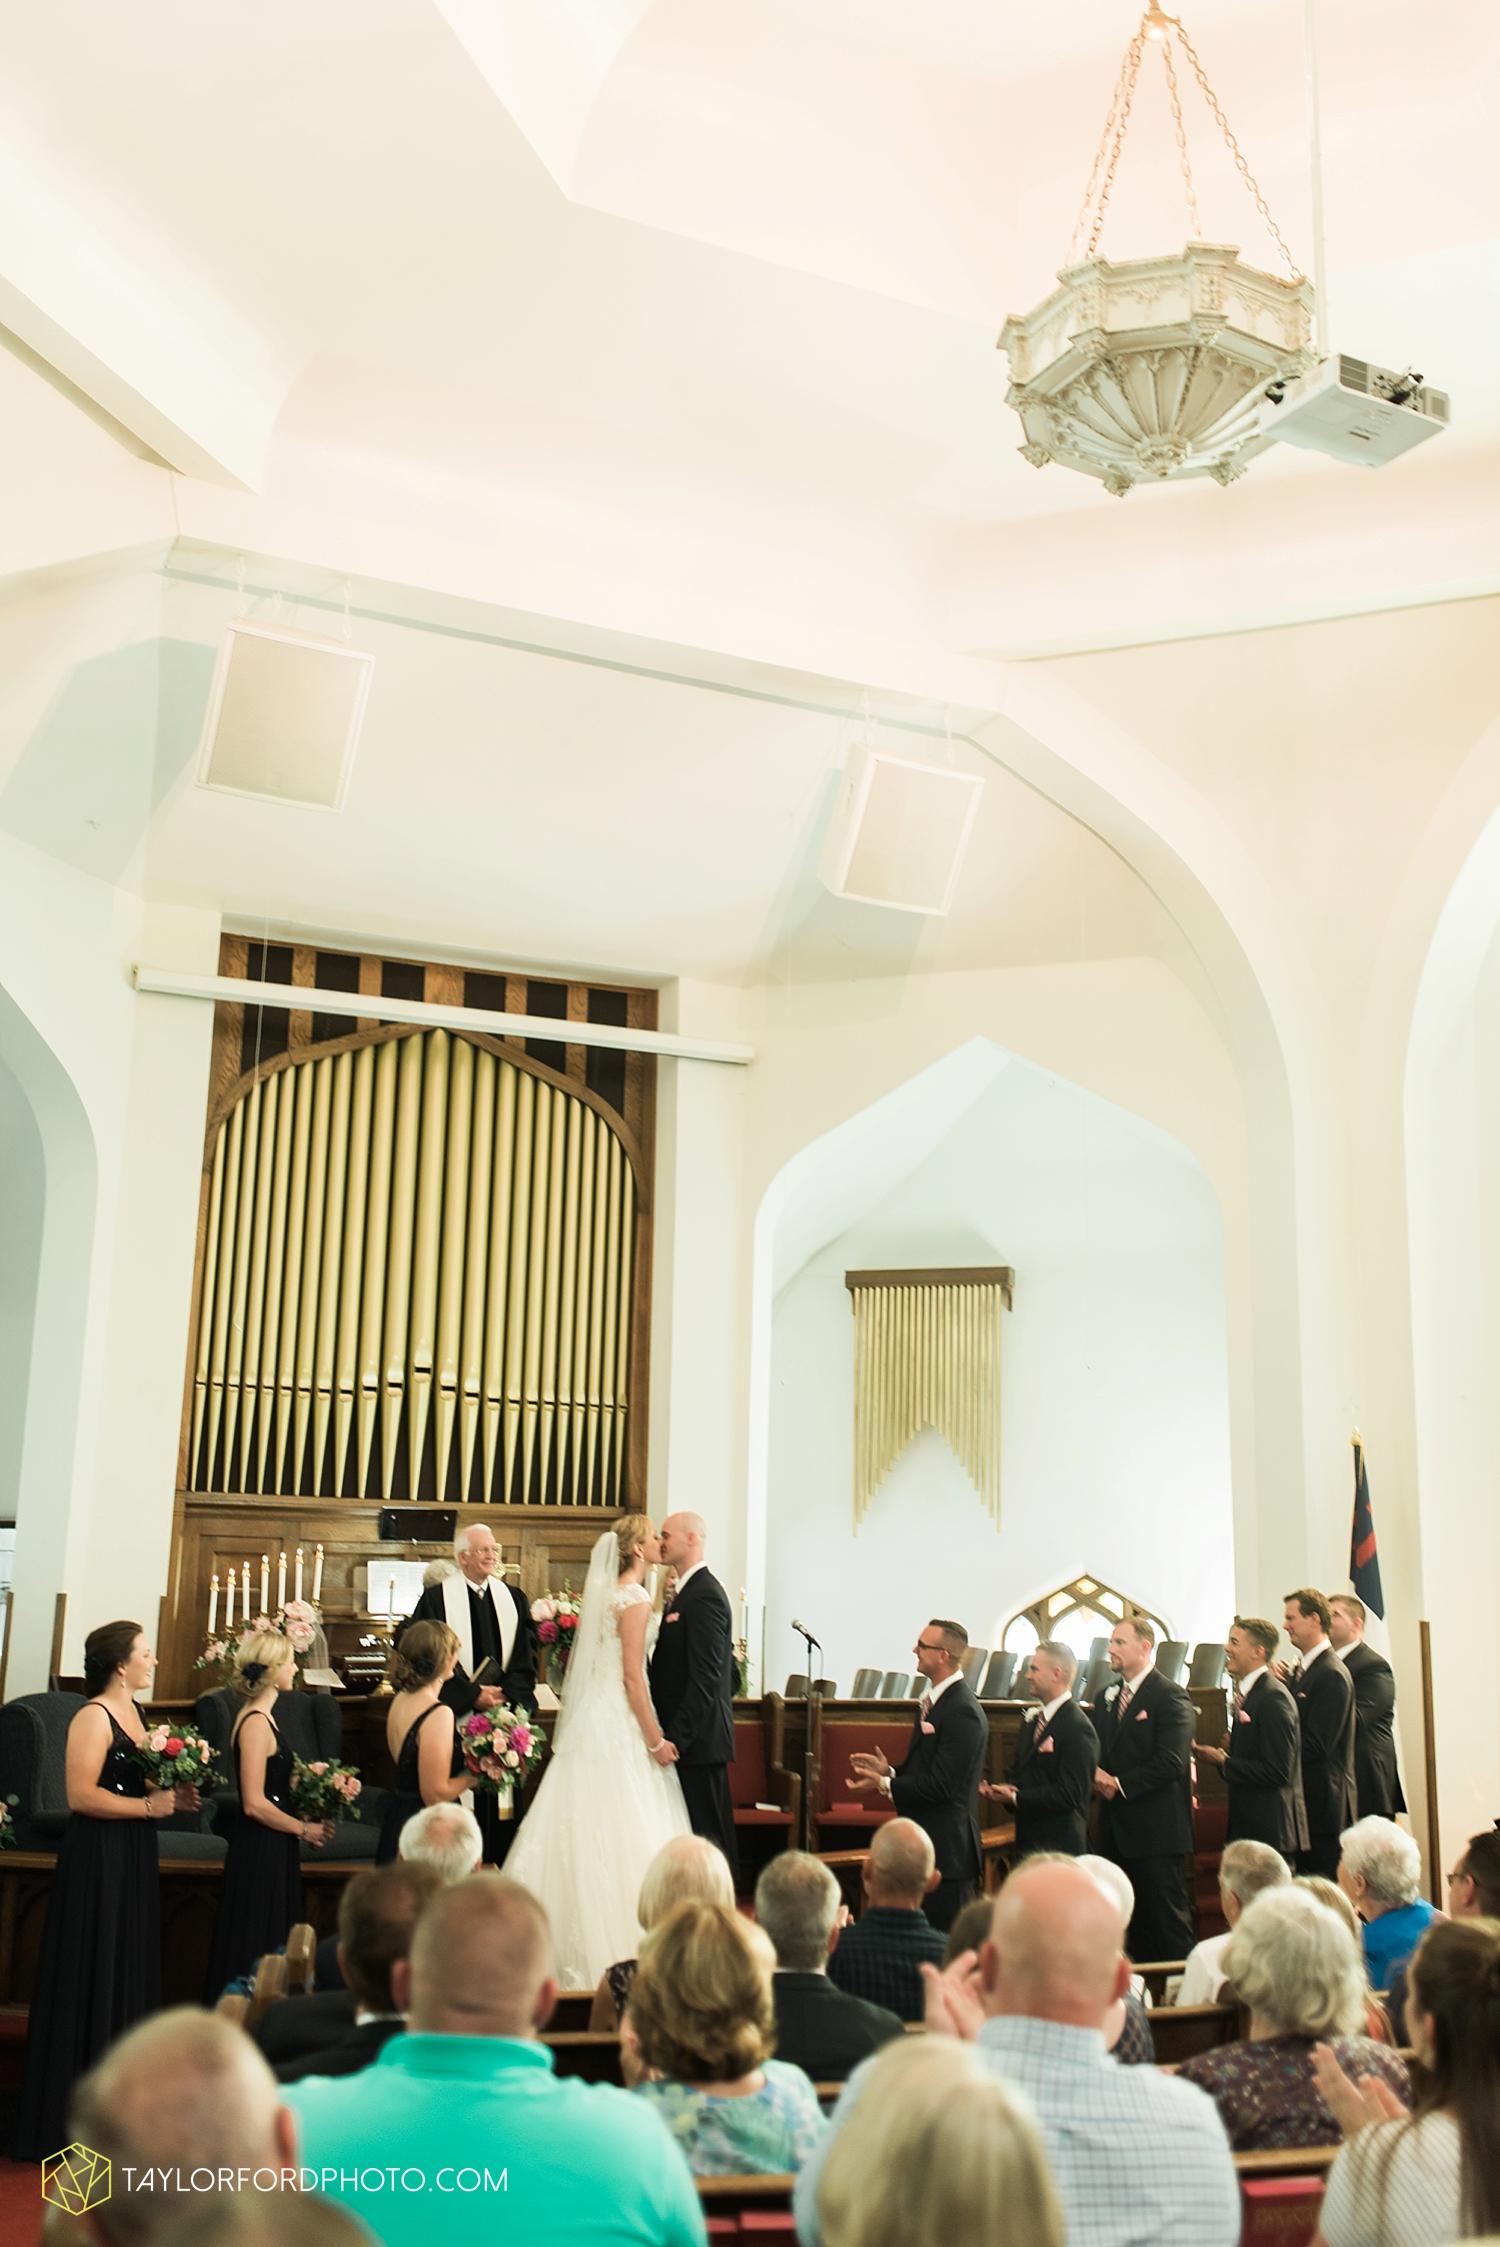 van_wert_ohio_fort_wayne_indiana__photographer_taylor_ford_nashville_tennessee_family_wedding_senior_cerutis_catering_2476.jpg